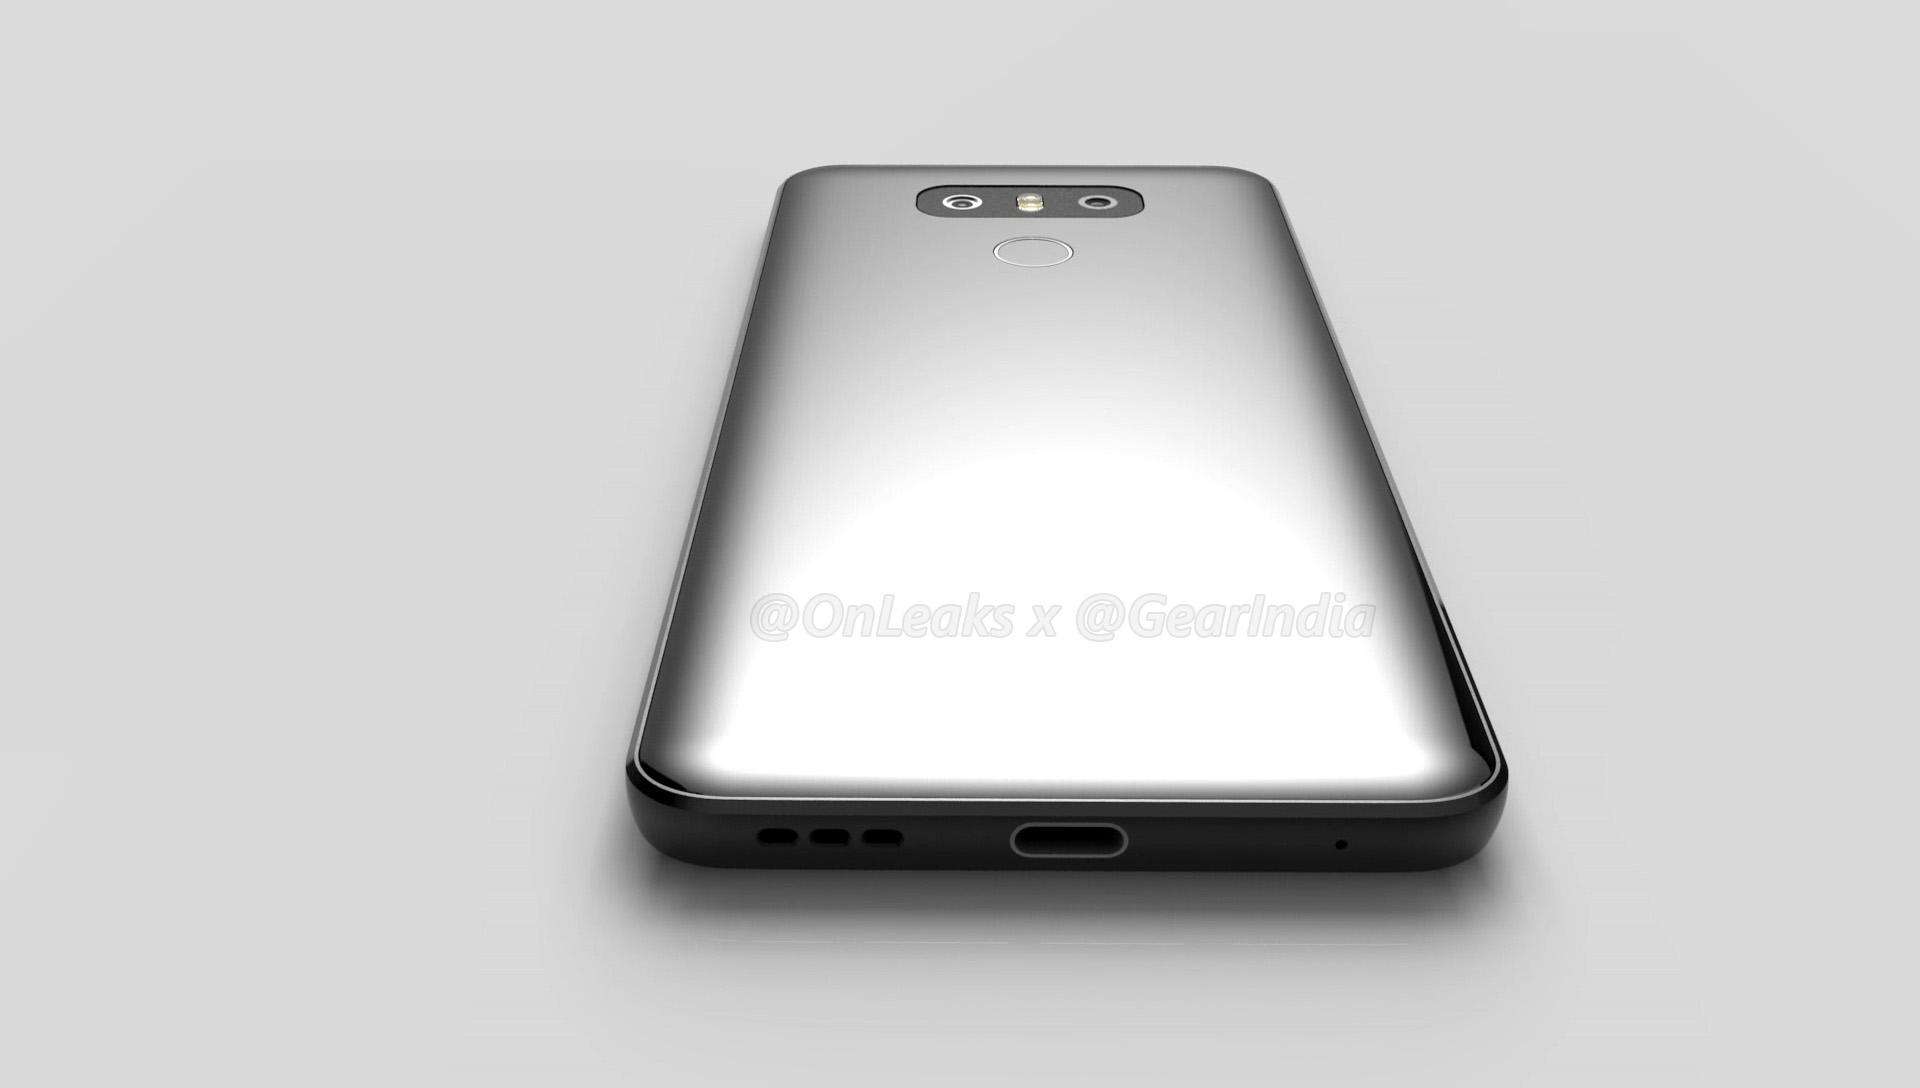 LG G6 to sport dual 13-megapixel camera set up at the back